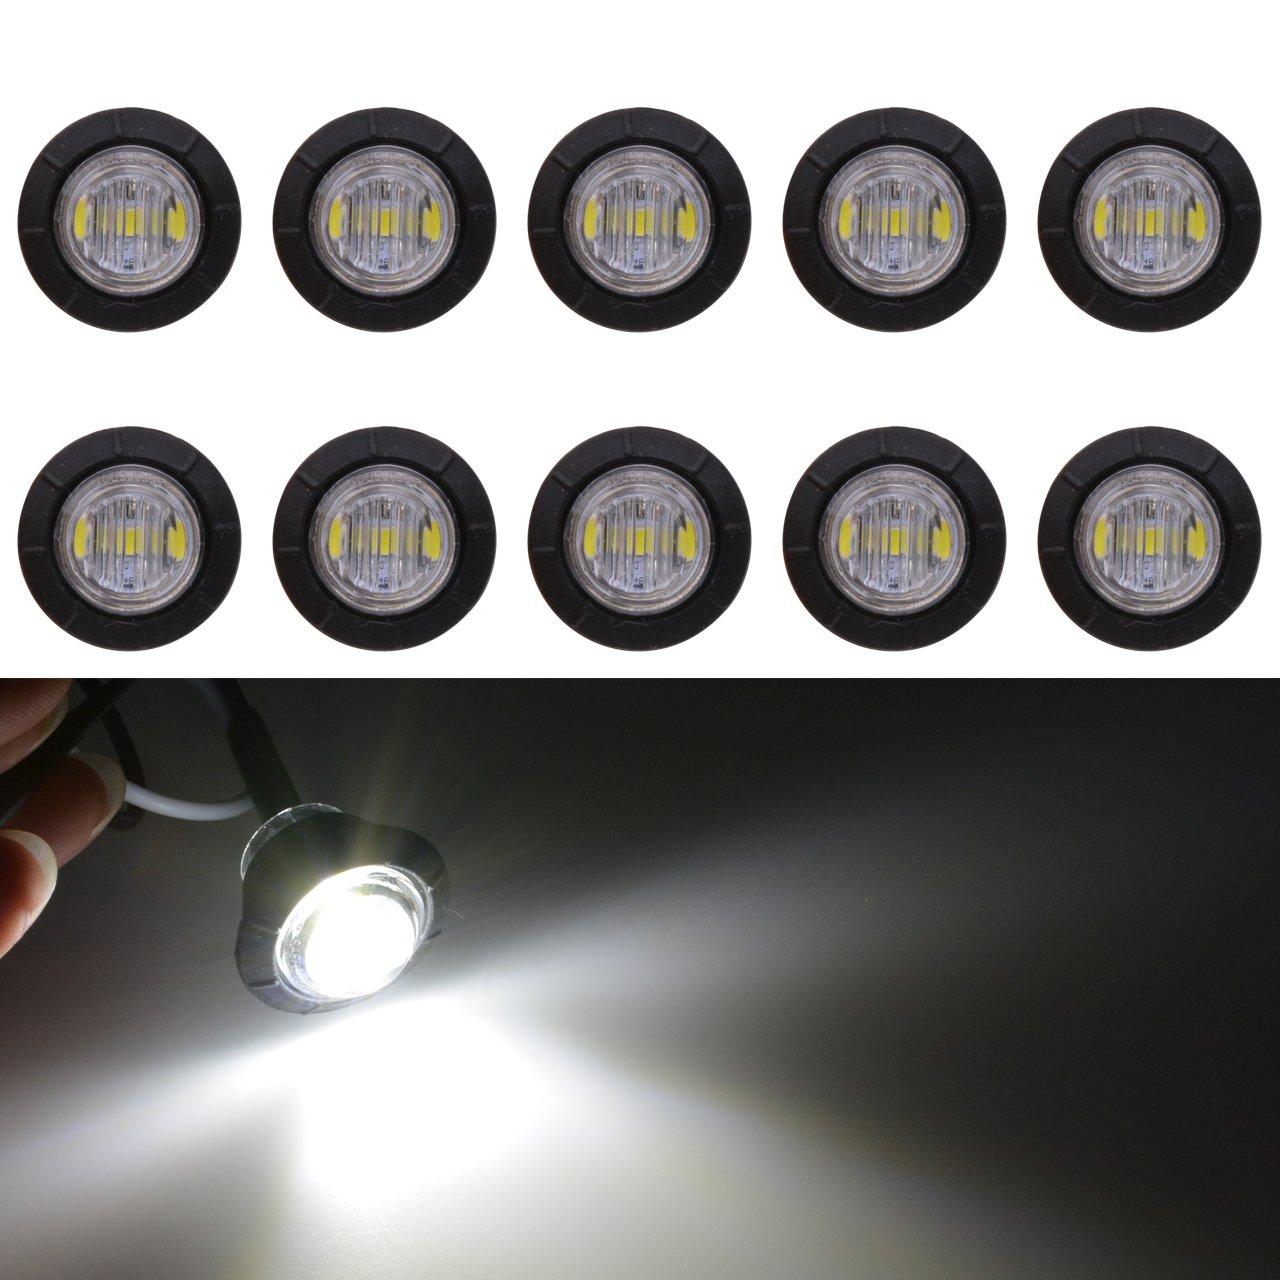 KaTur 3/4' Round LED Front Rear Side Marker Indicators Light Waterproof Bullet Clearance Marker Light 12V for Car Truck (White)